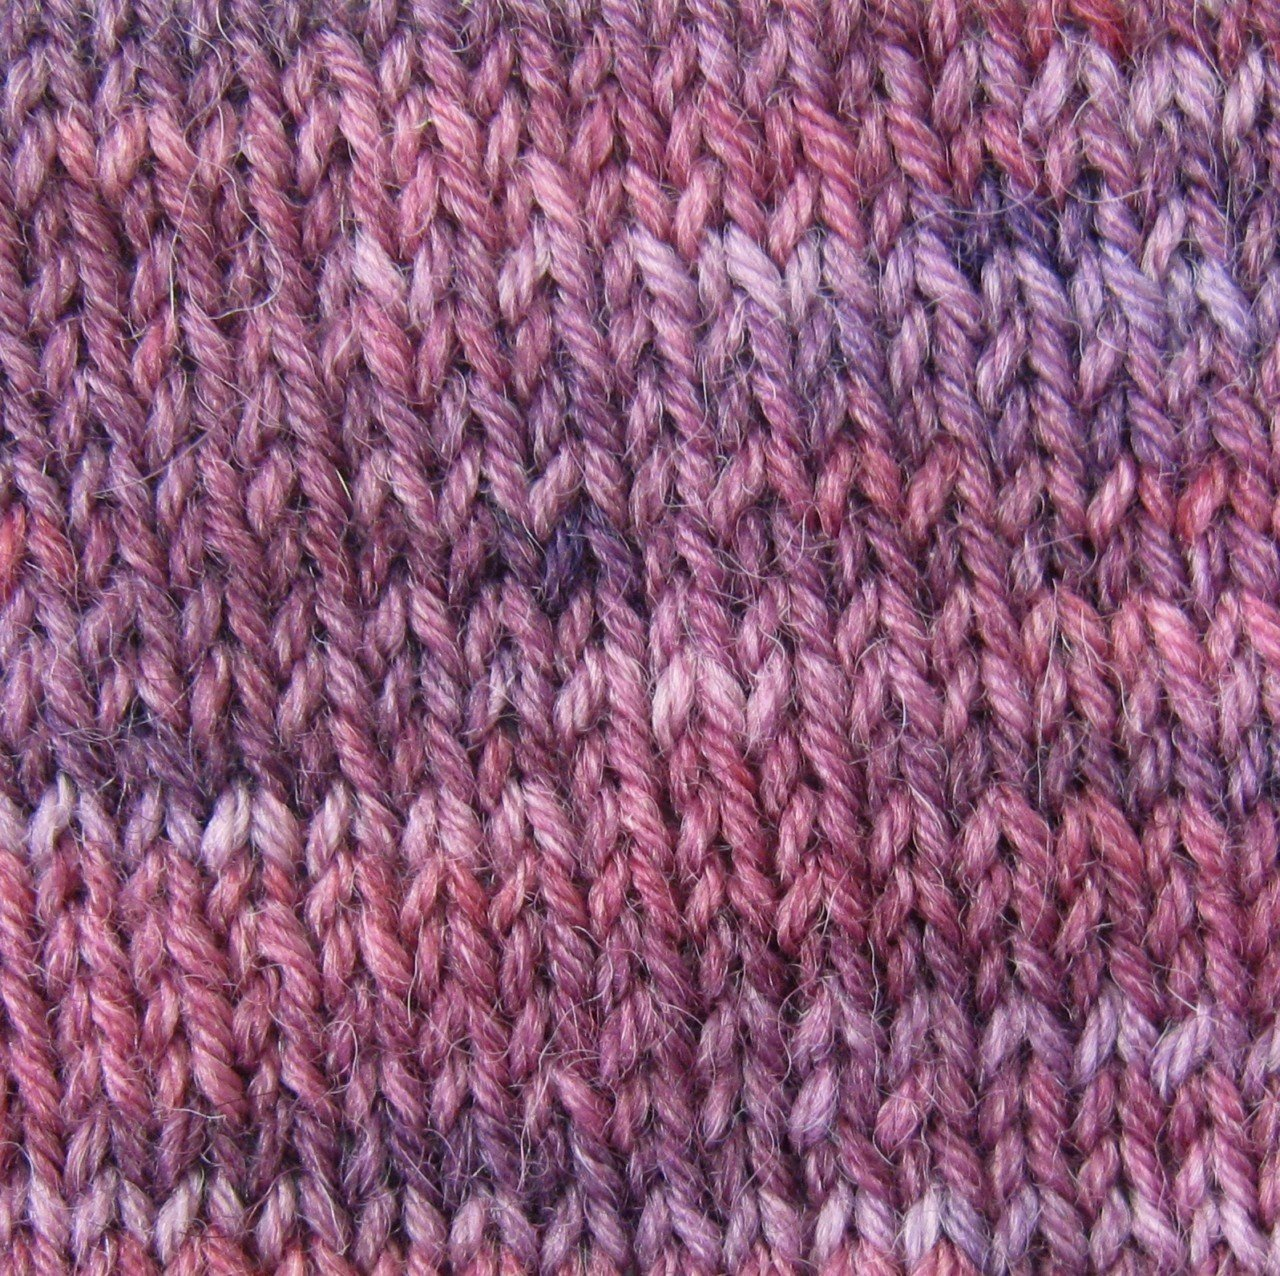 Alpaca and Superwash Wool Sock Yarn - Fresh Violets